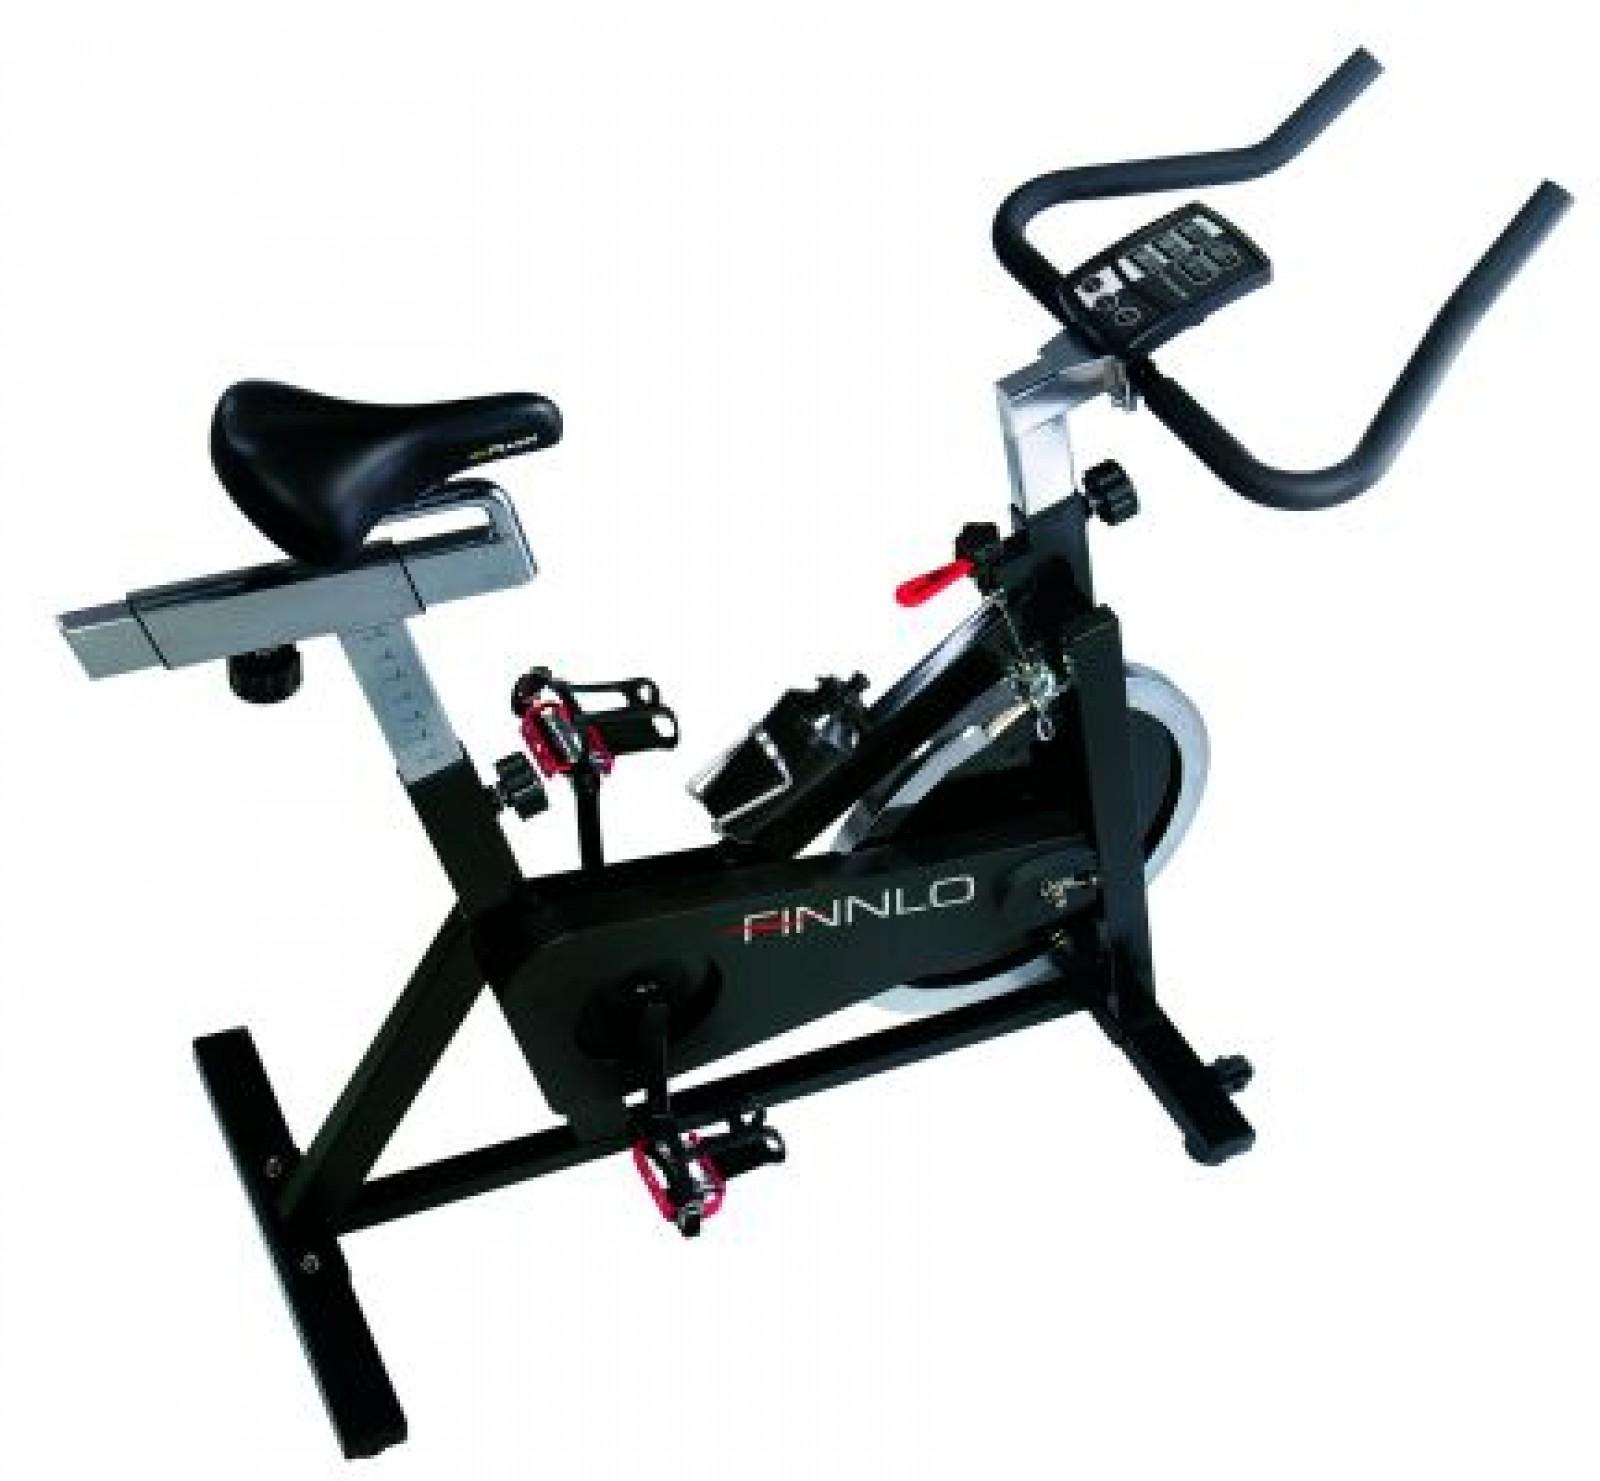 finnlo indoor cycle speed bike buy test t fitness. Black Bedroom Furniture Sets. Home Design Ideas